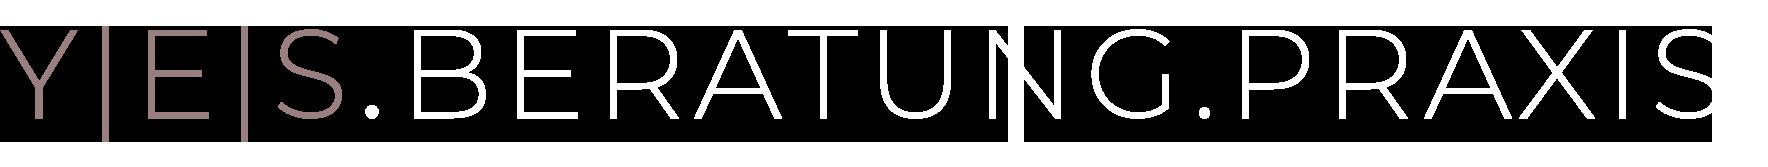 YES-Beratung-Logo-Sticky